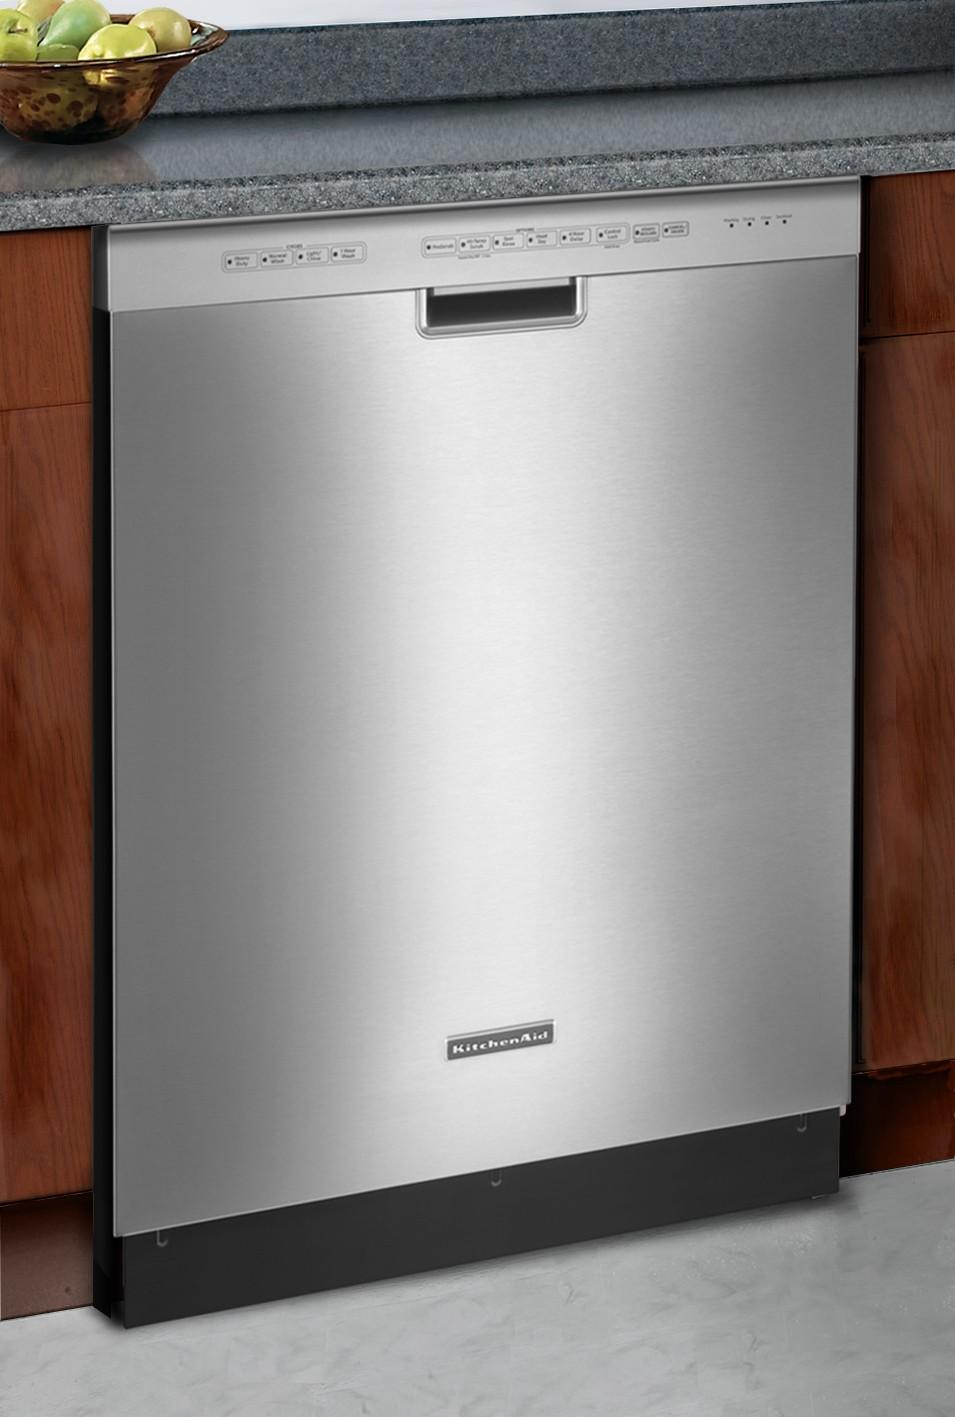 Kuds30ixbl kitchenaid kuds30ixbl superba series for Kitchenaid dishwasher